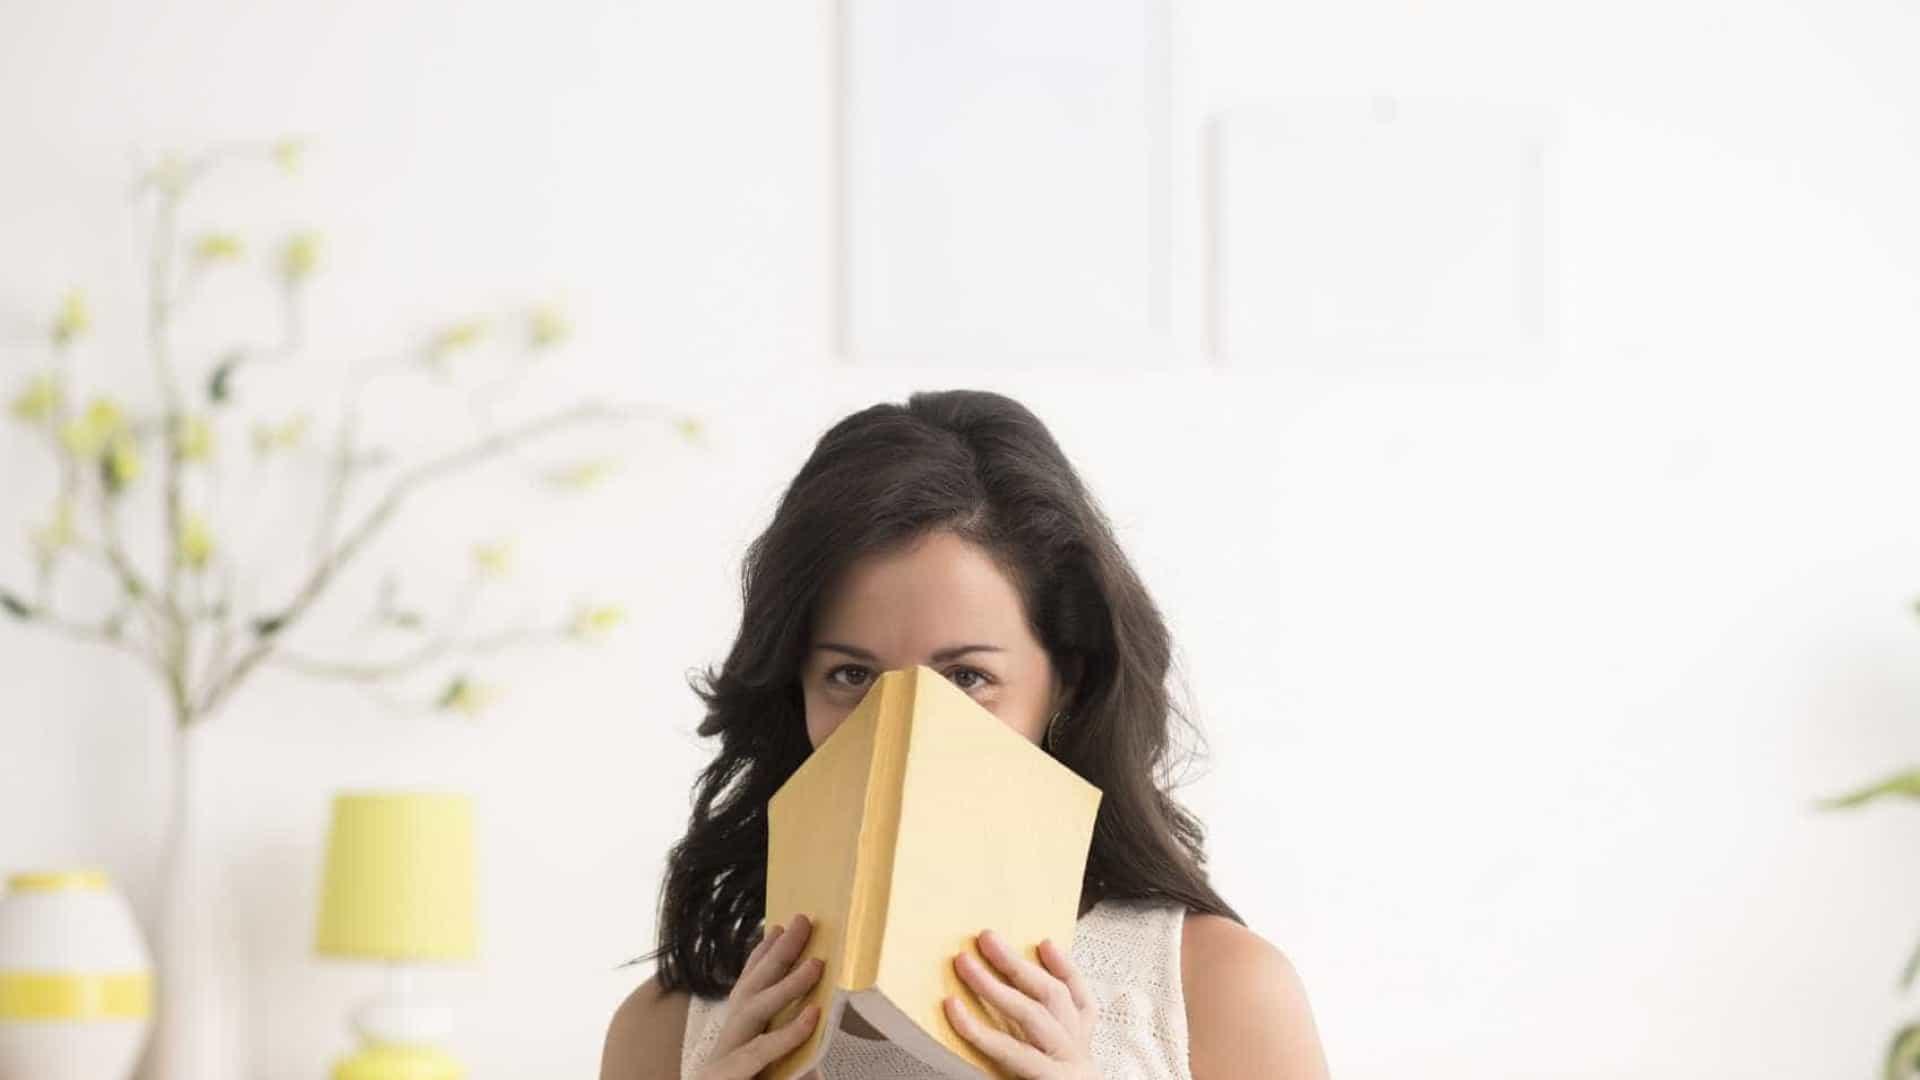 5 Coisas Que Só As Pessoas Introvertidas Entendem